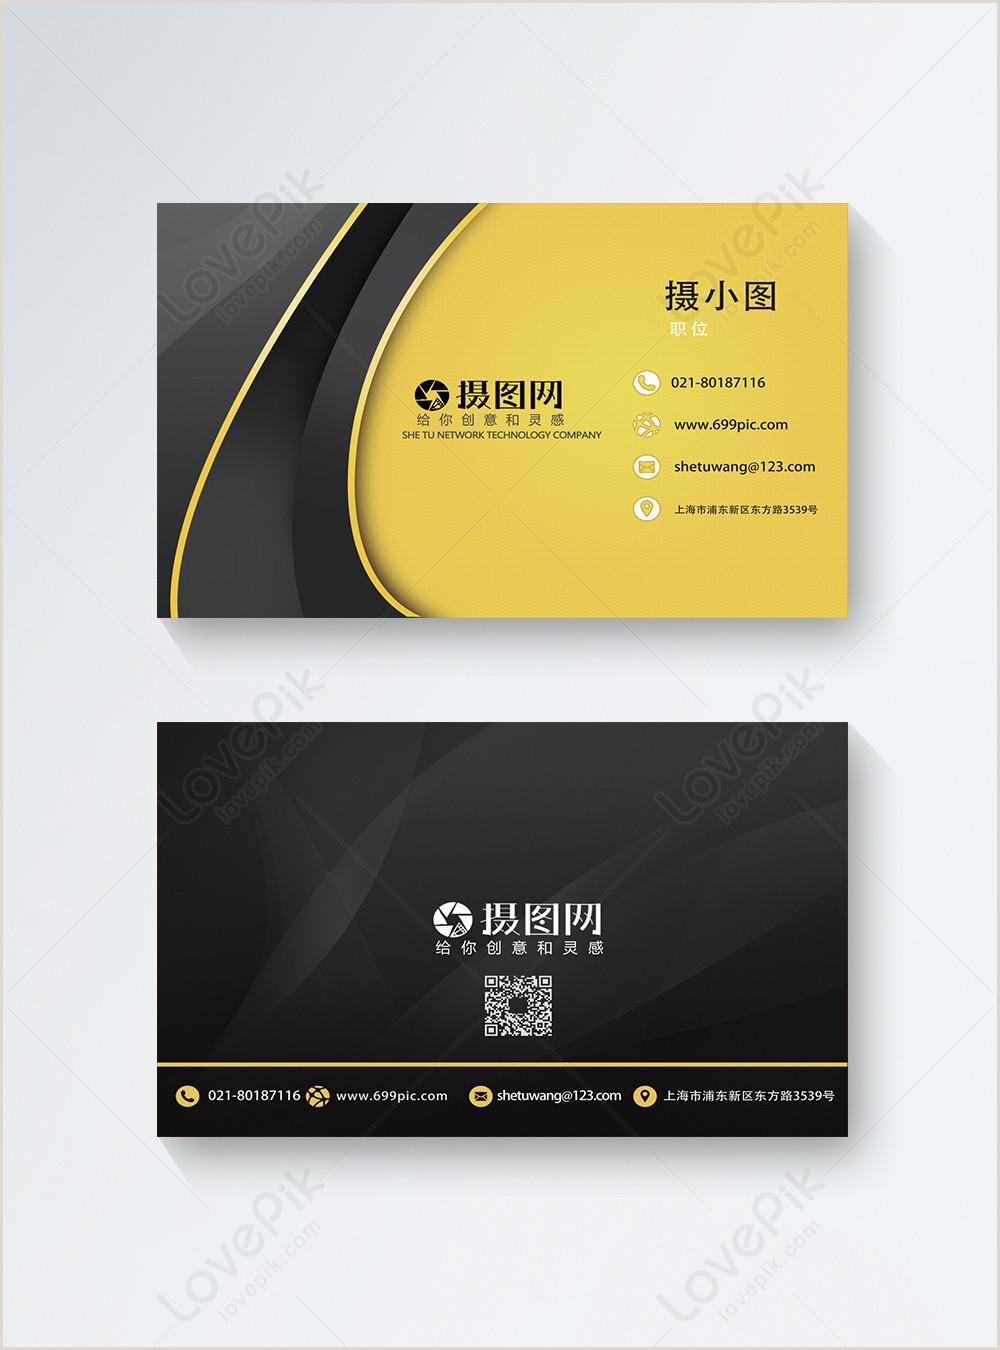 Fashion Business Cards Templates Free Fashion Business Card Design Template Image Picture Free